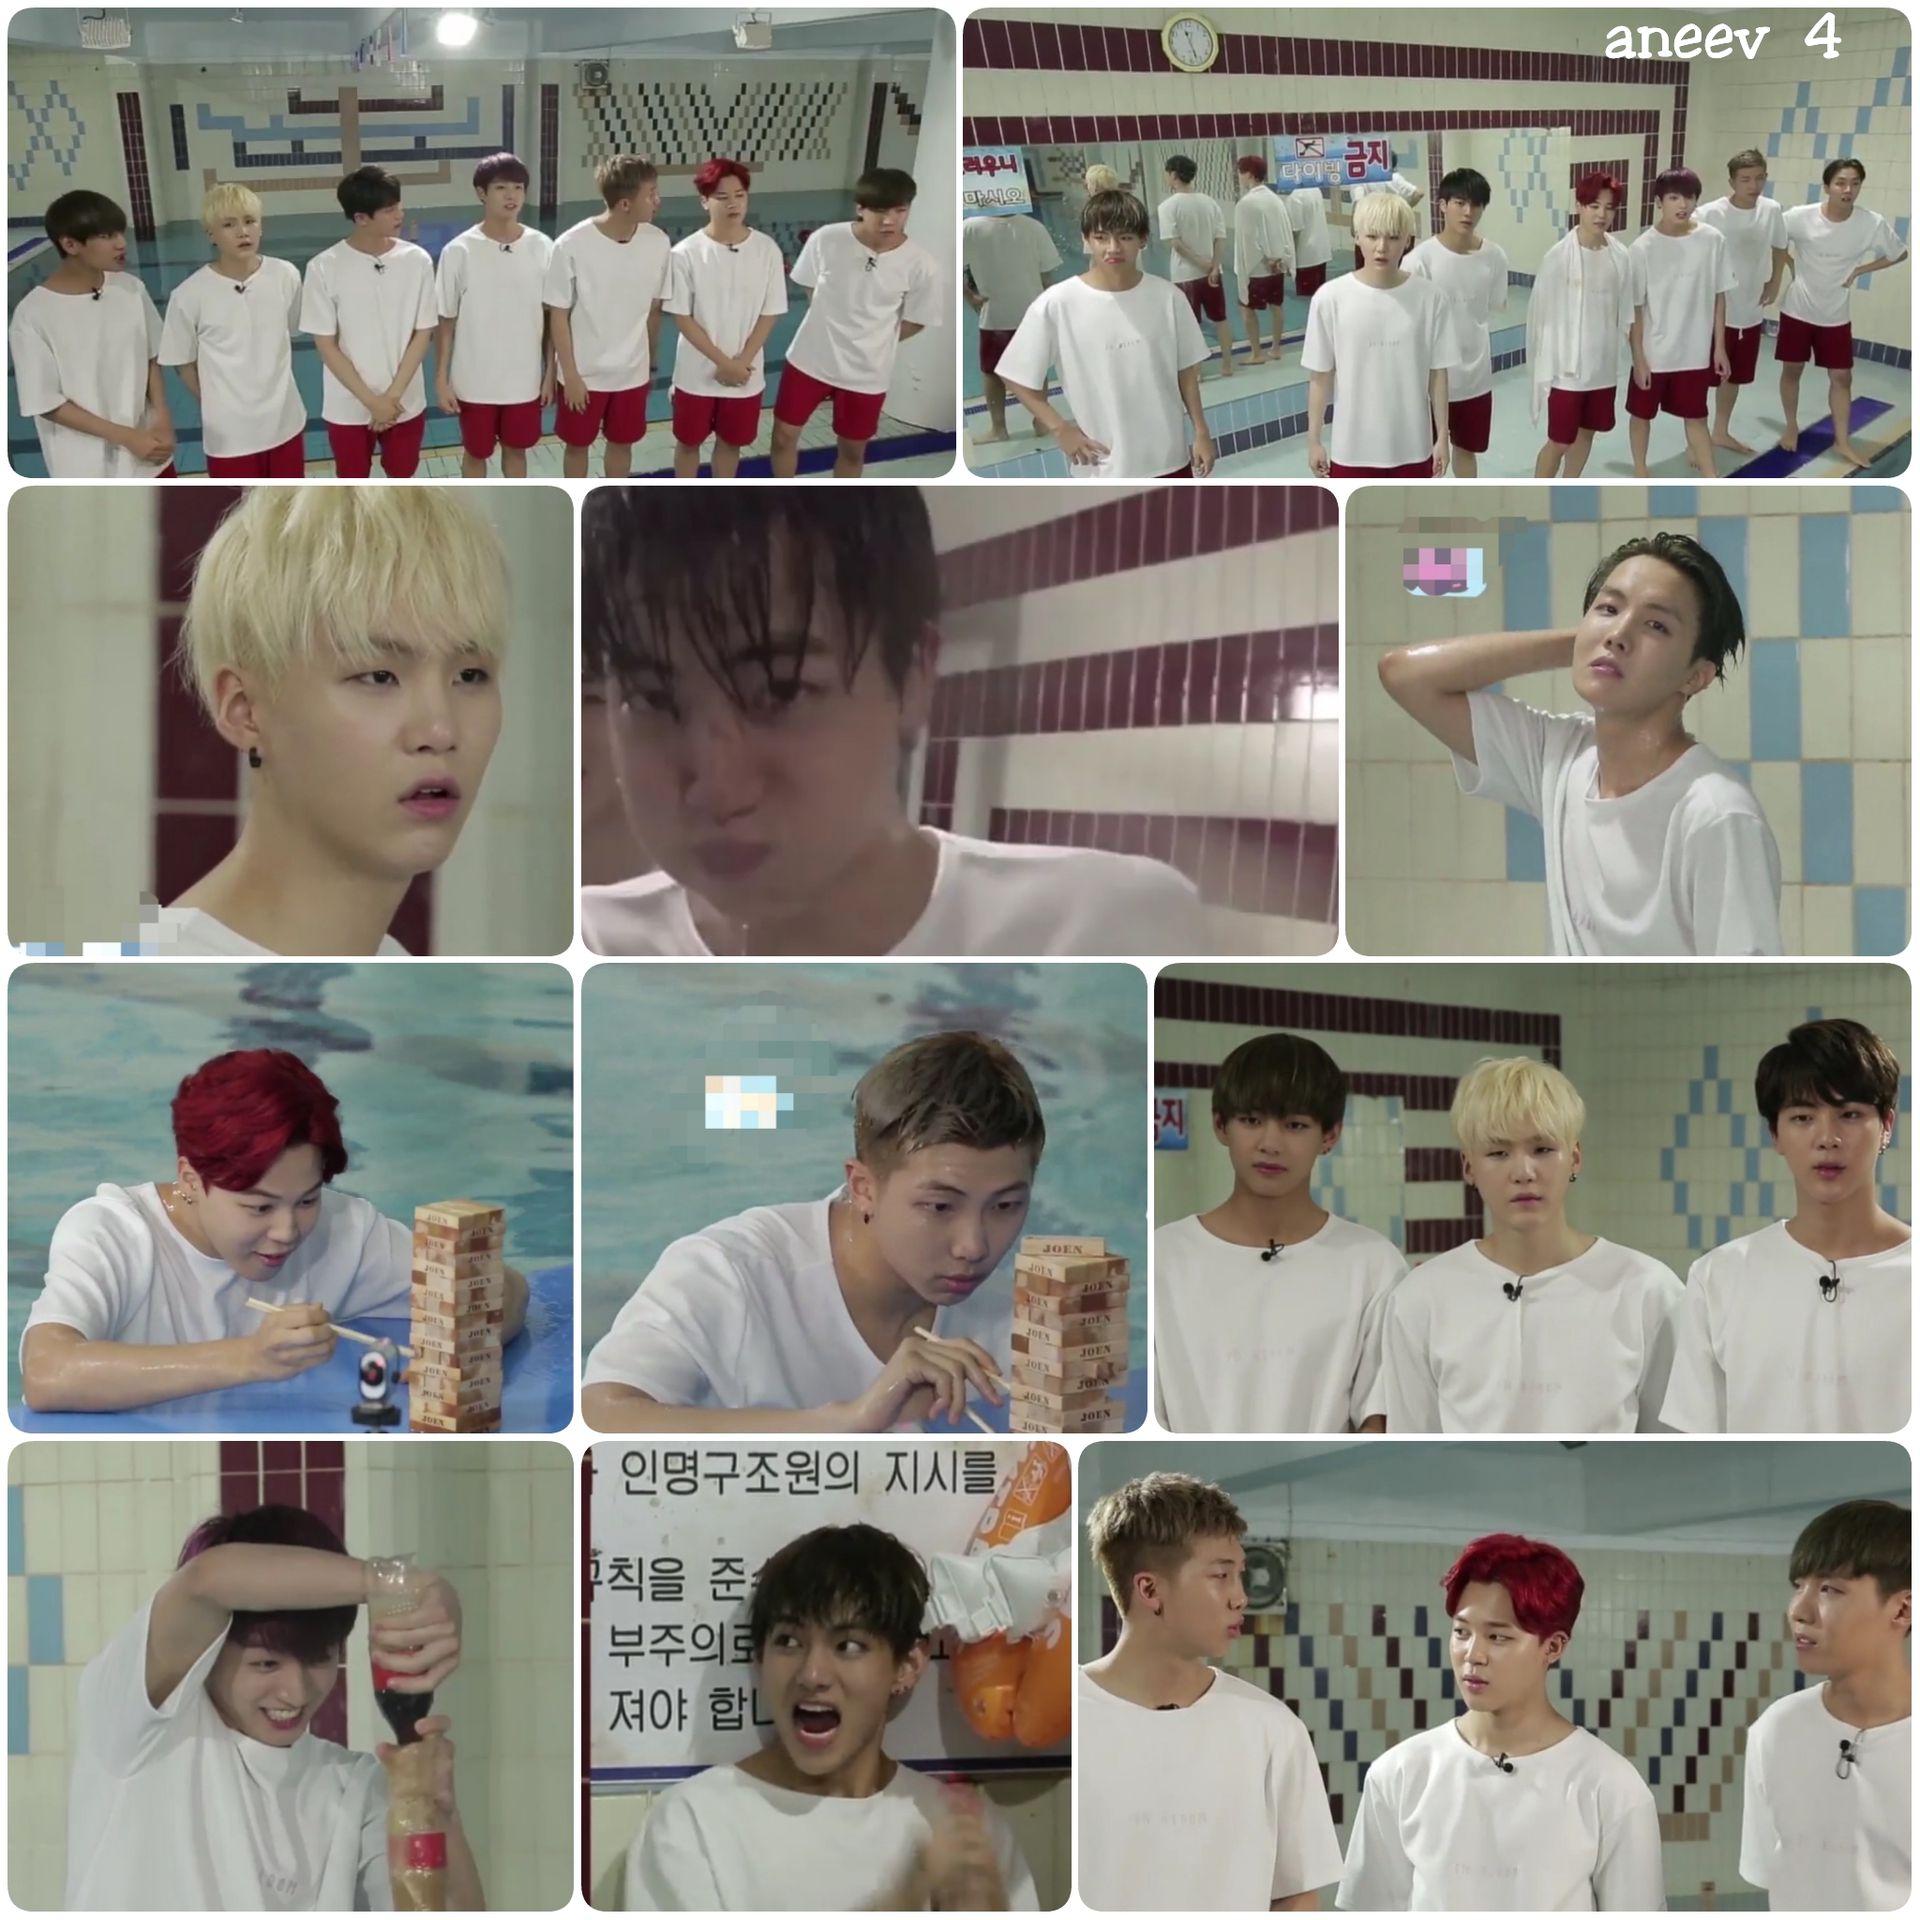 RUN BTS Episodes - RUN BTS 4 - Wattpad